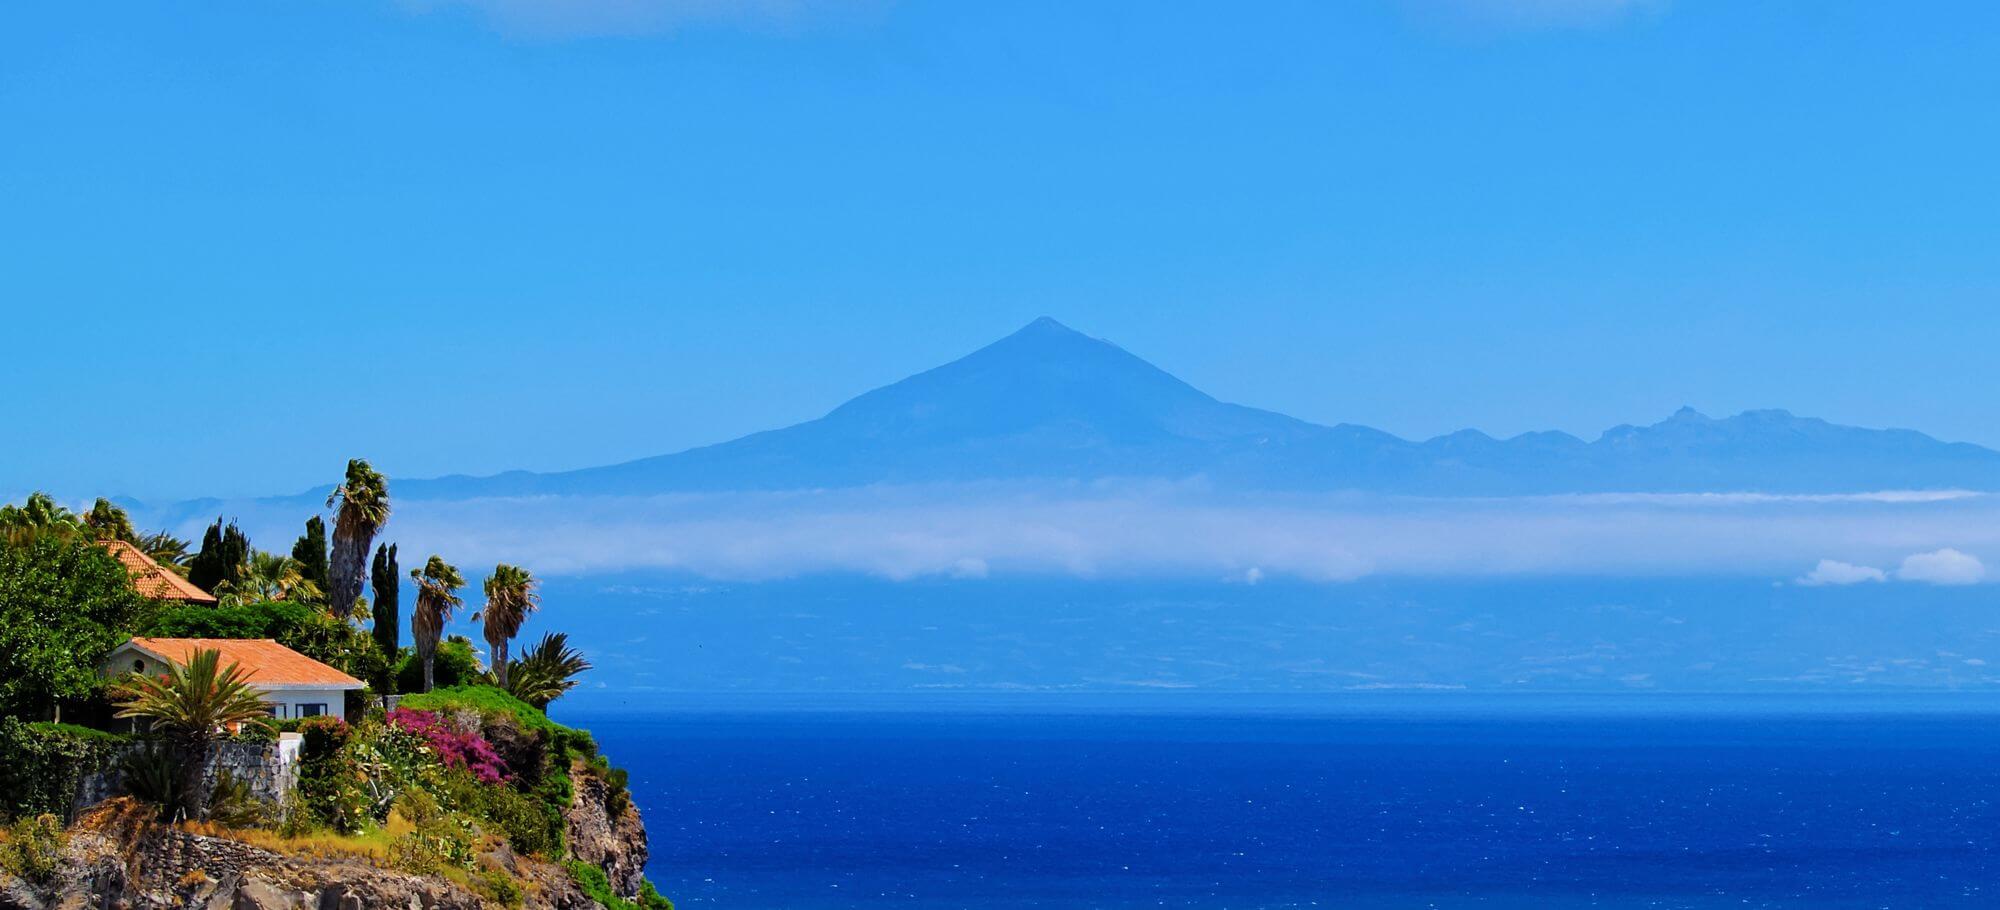 Wandern auf La Gomera mit Blick auf Teneriffa